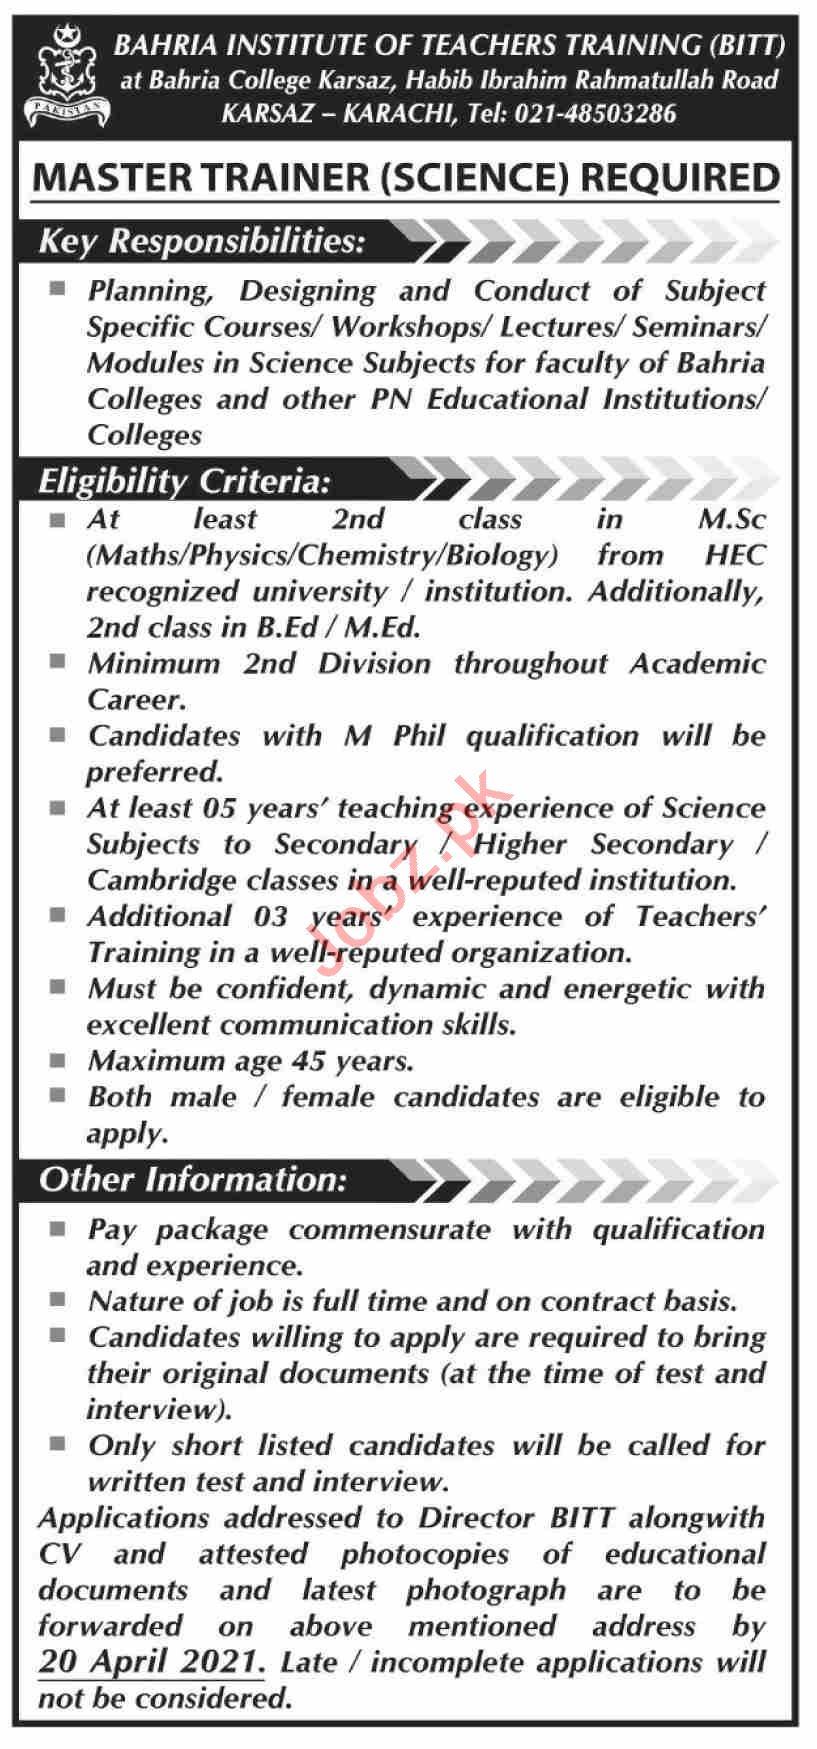 Bahria Institute of Teachers Training BITT Karachi Jobs 2021